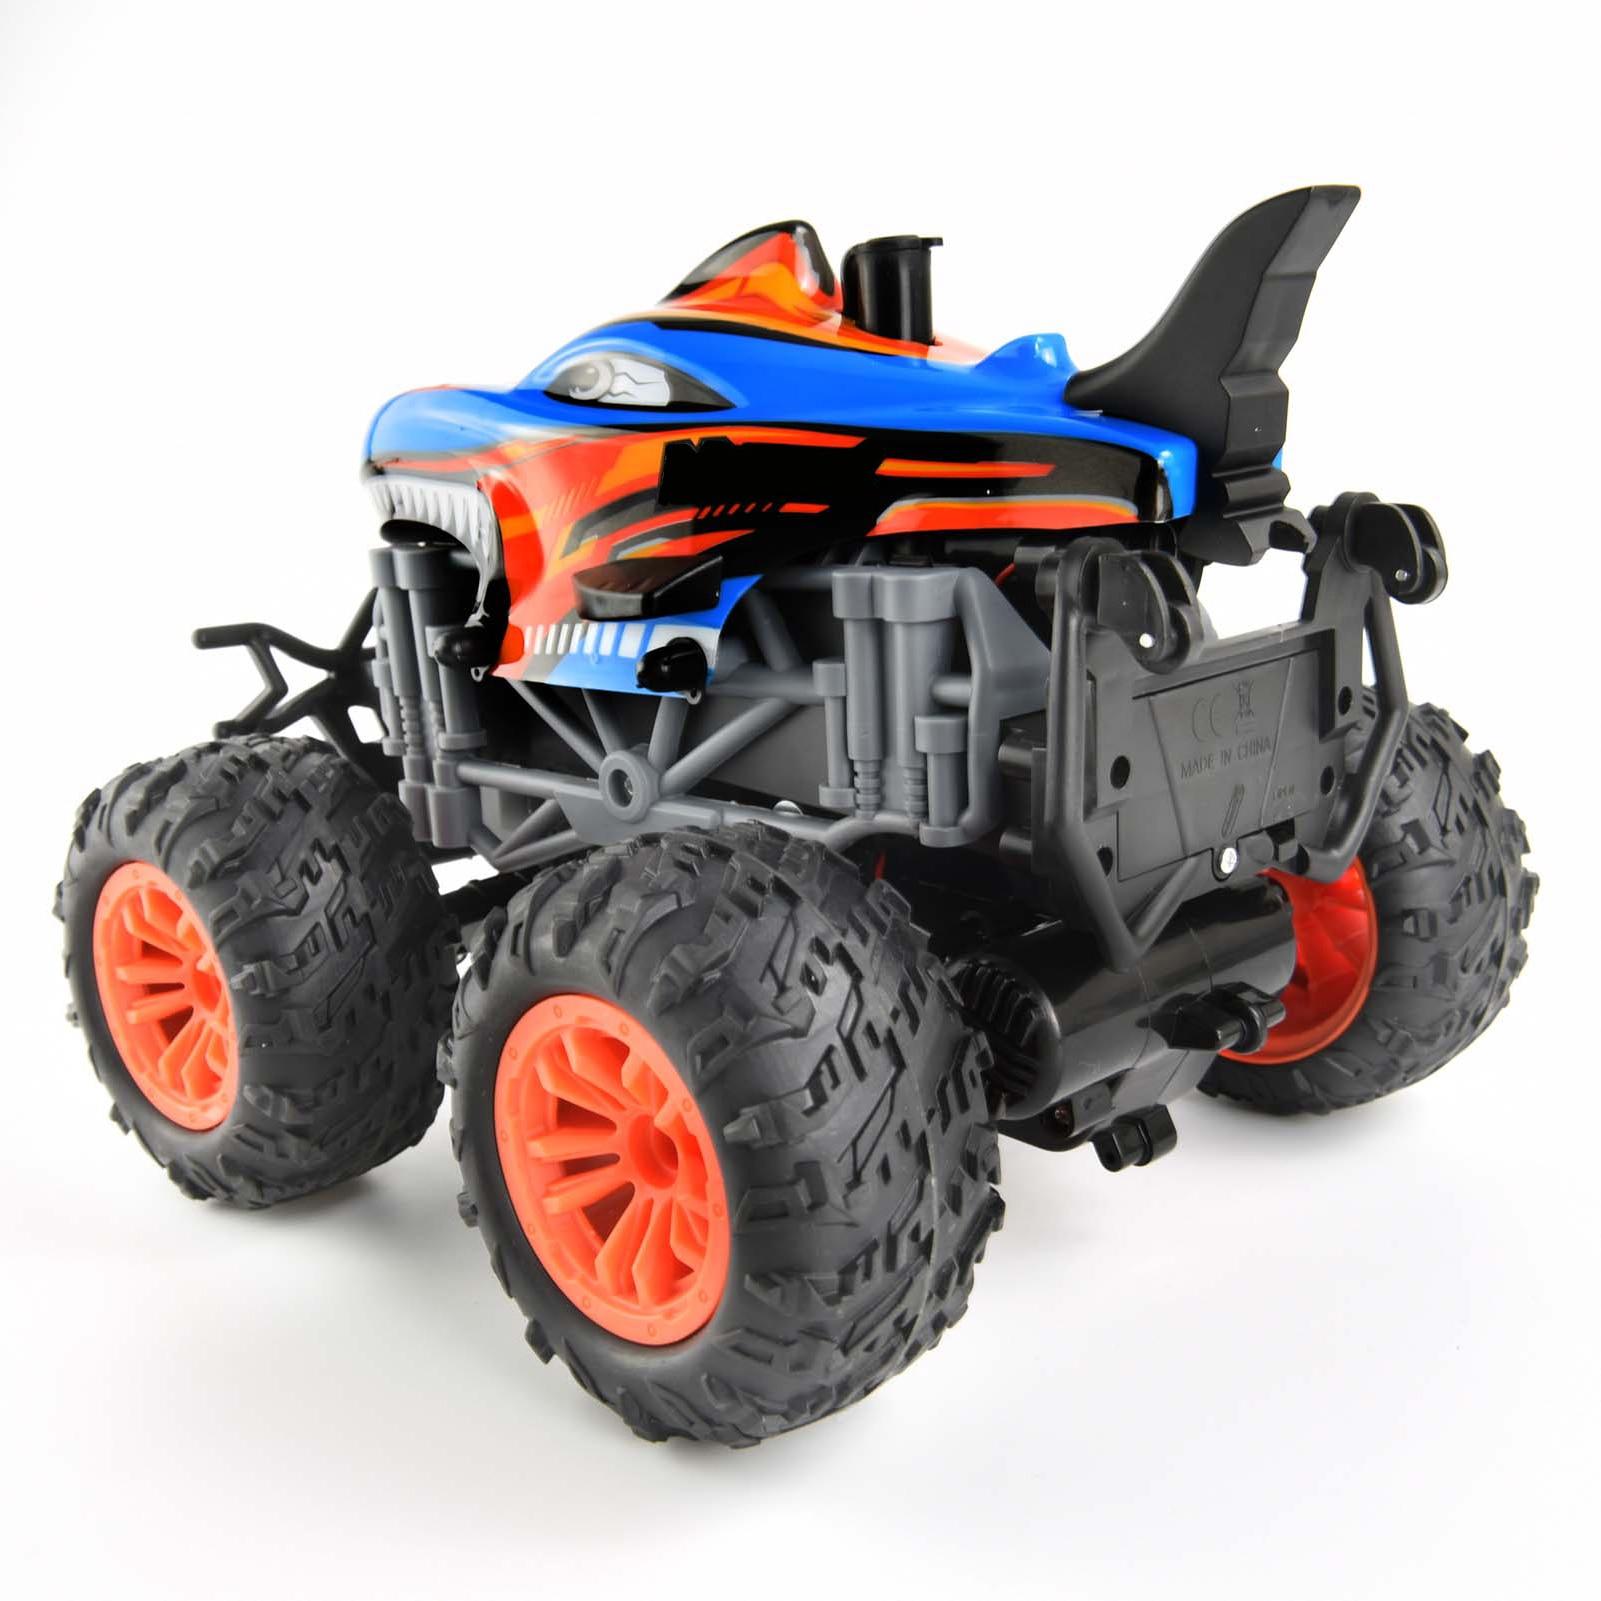 RC Spray Car 1/18 RC Car 2.4Ghz Stunt Car Remote Control Stunt Vehicle Toys with Rear Fog Stream Music LED Light Auto-Play enlarge